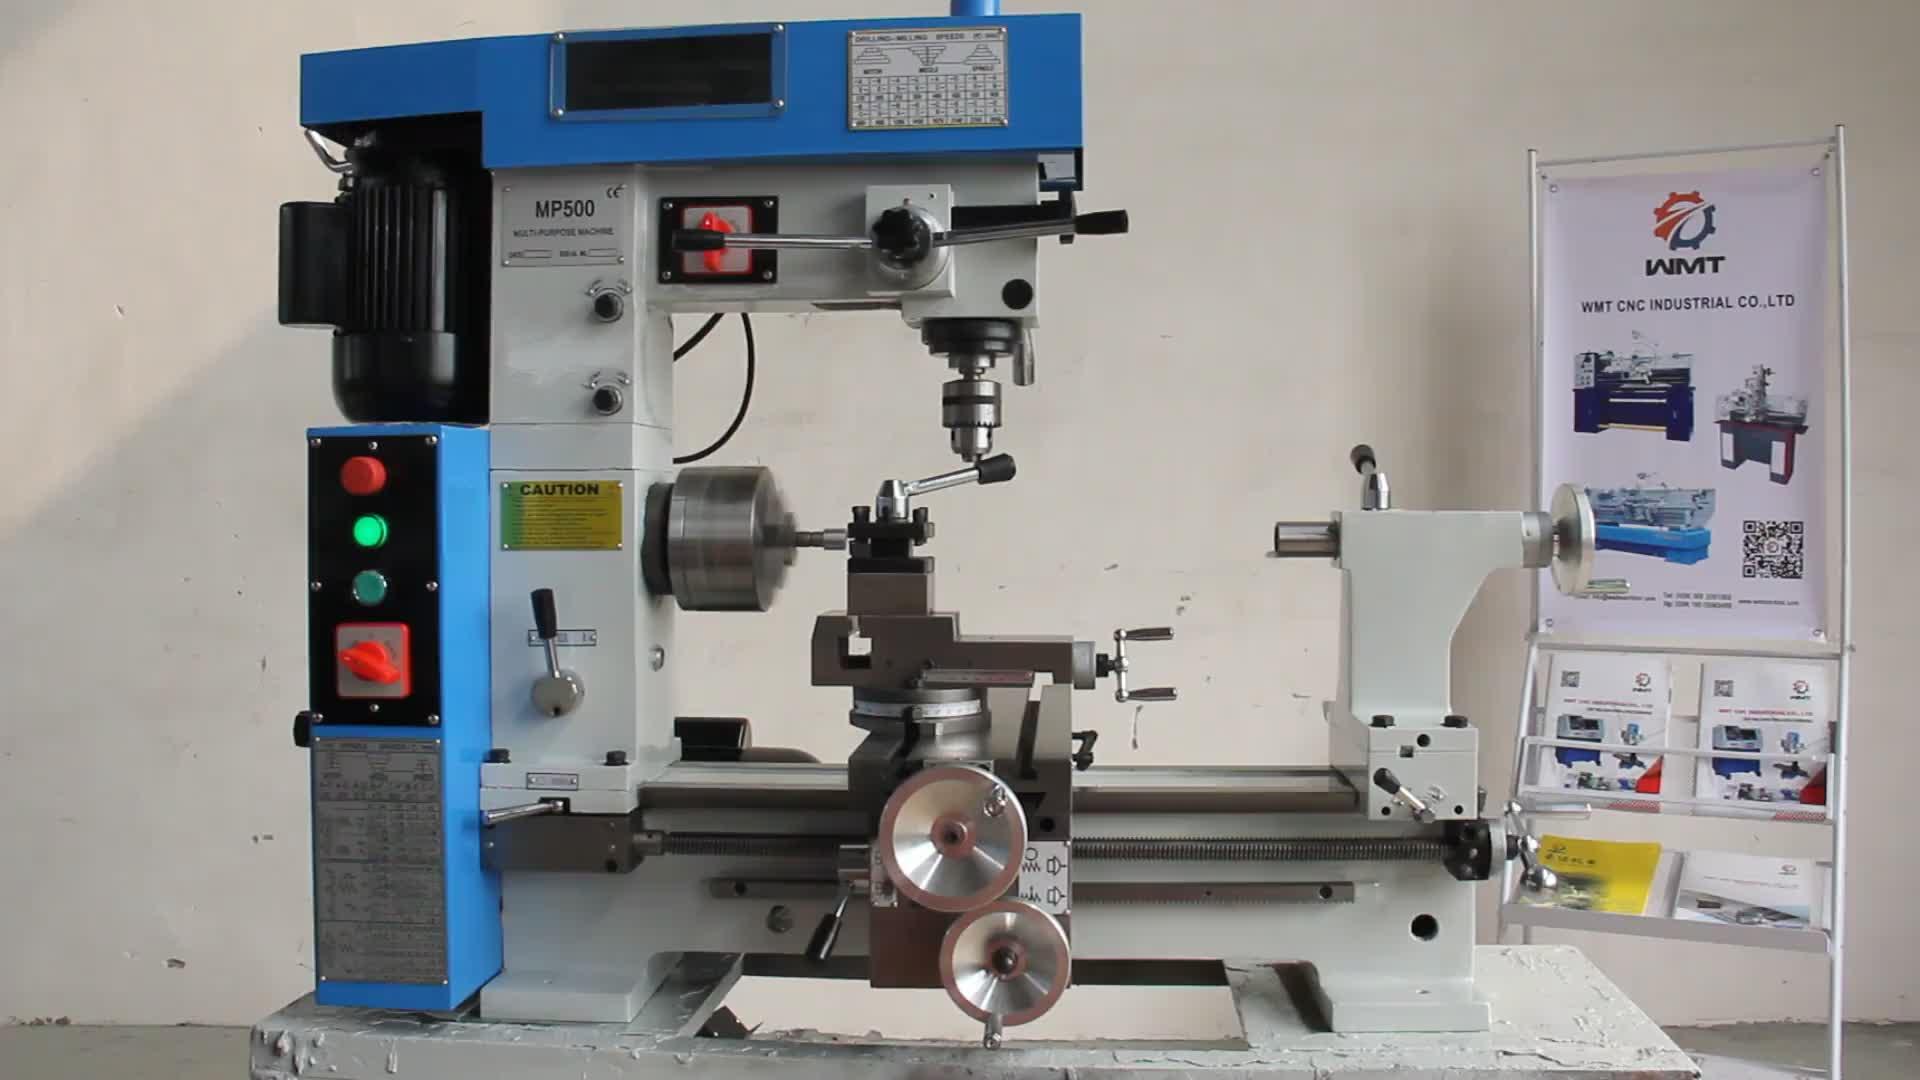 MP800 kombine mini metal torna makinesi